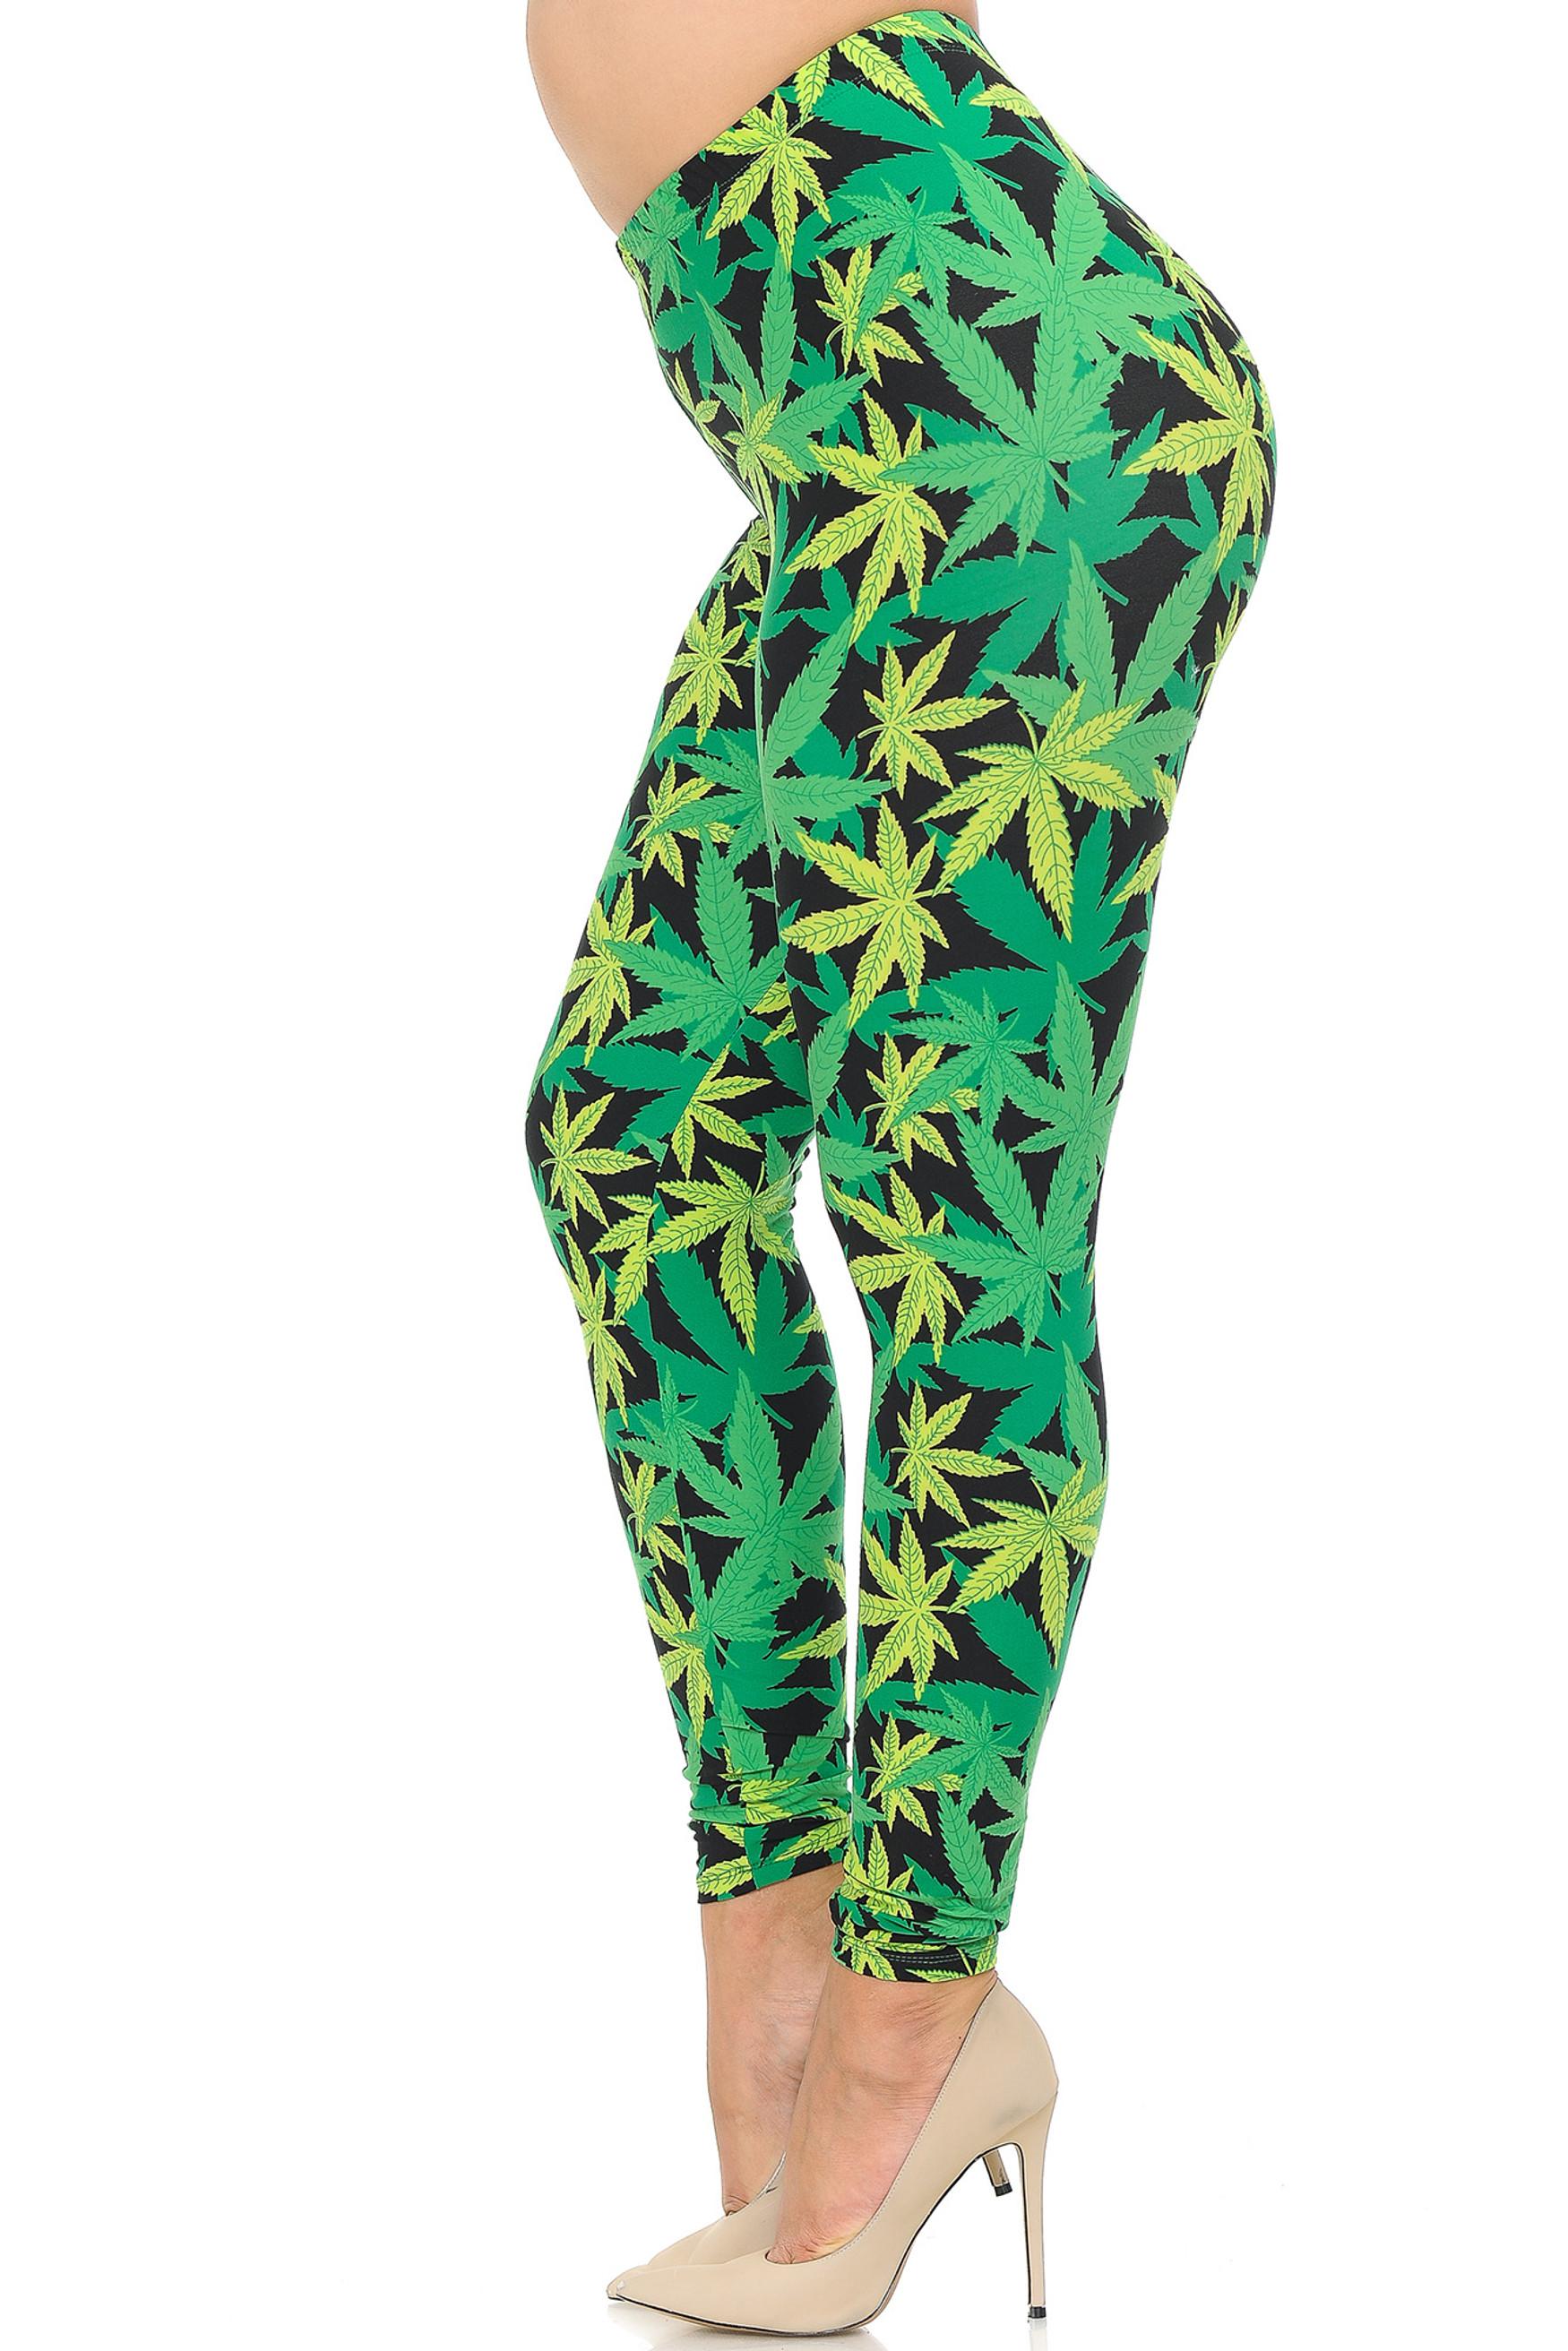 Brushed Cannabis Marijuana Extra Plus Size Leggings - 3X-5X - EEVEE